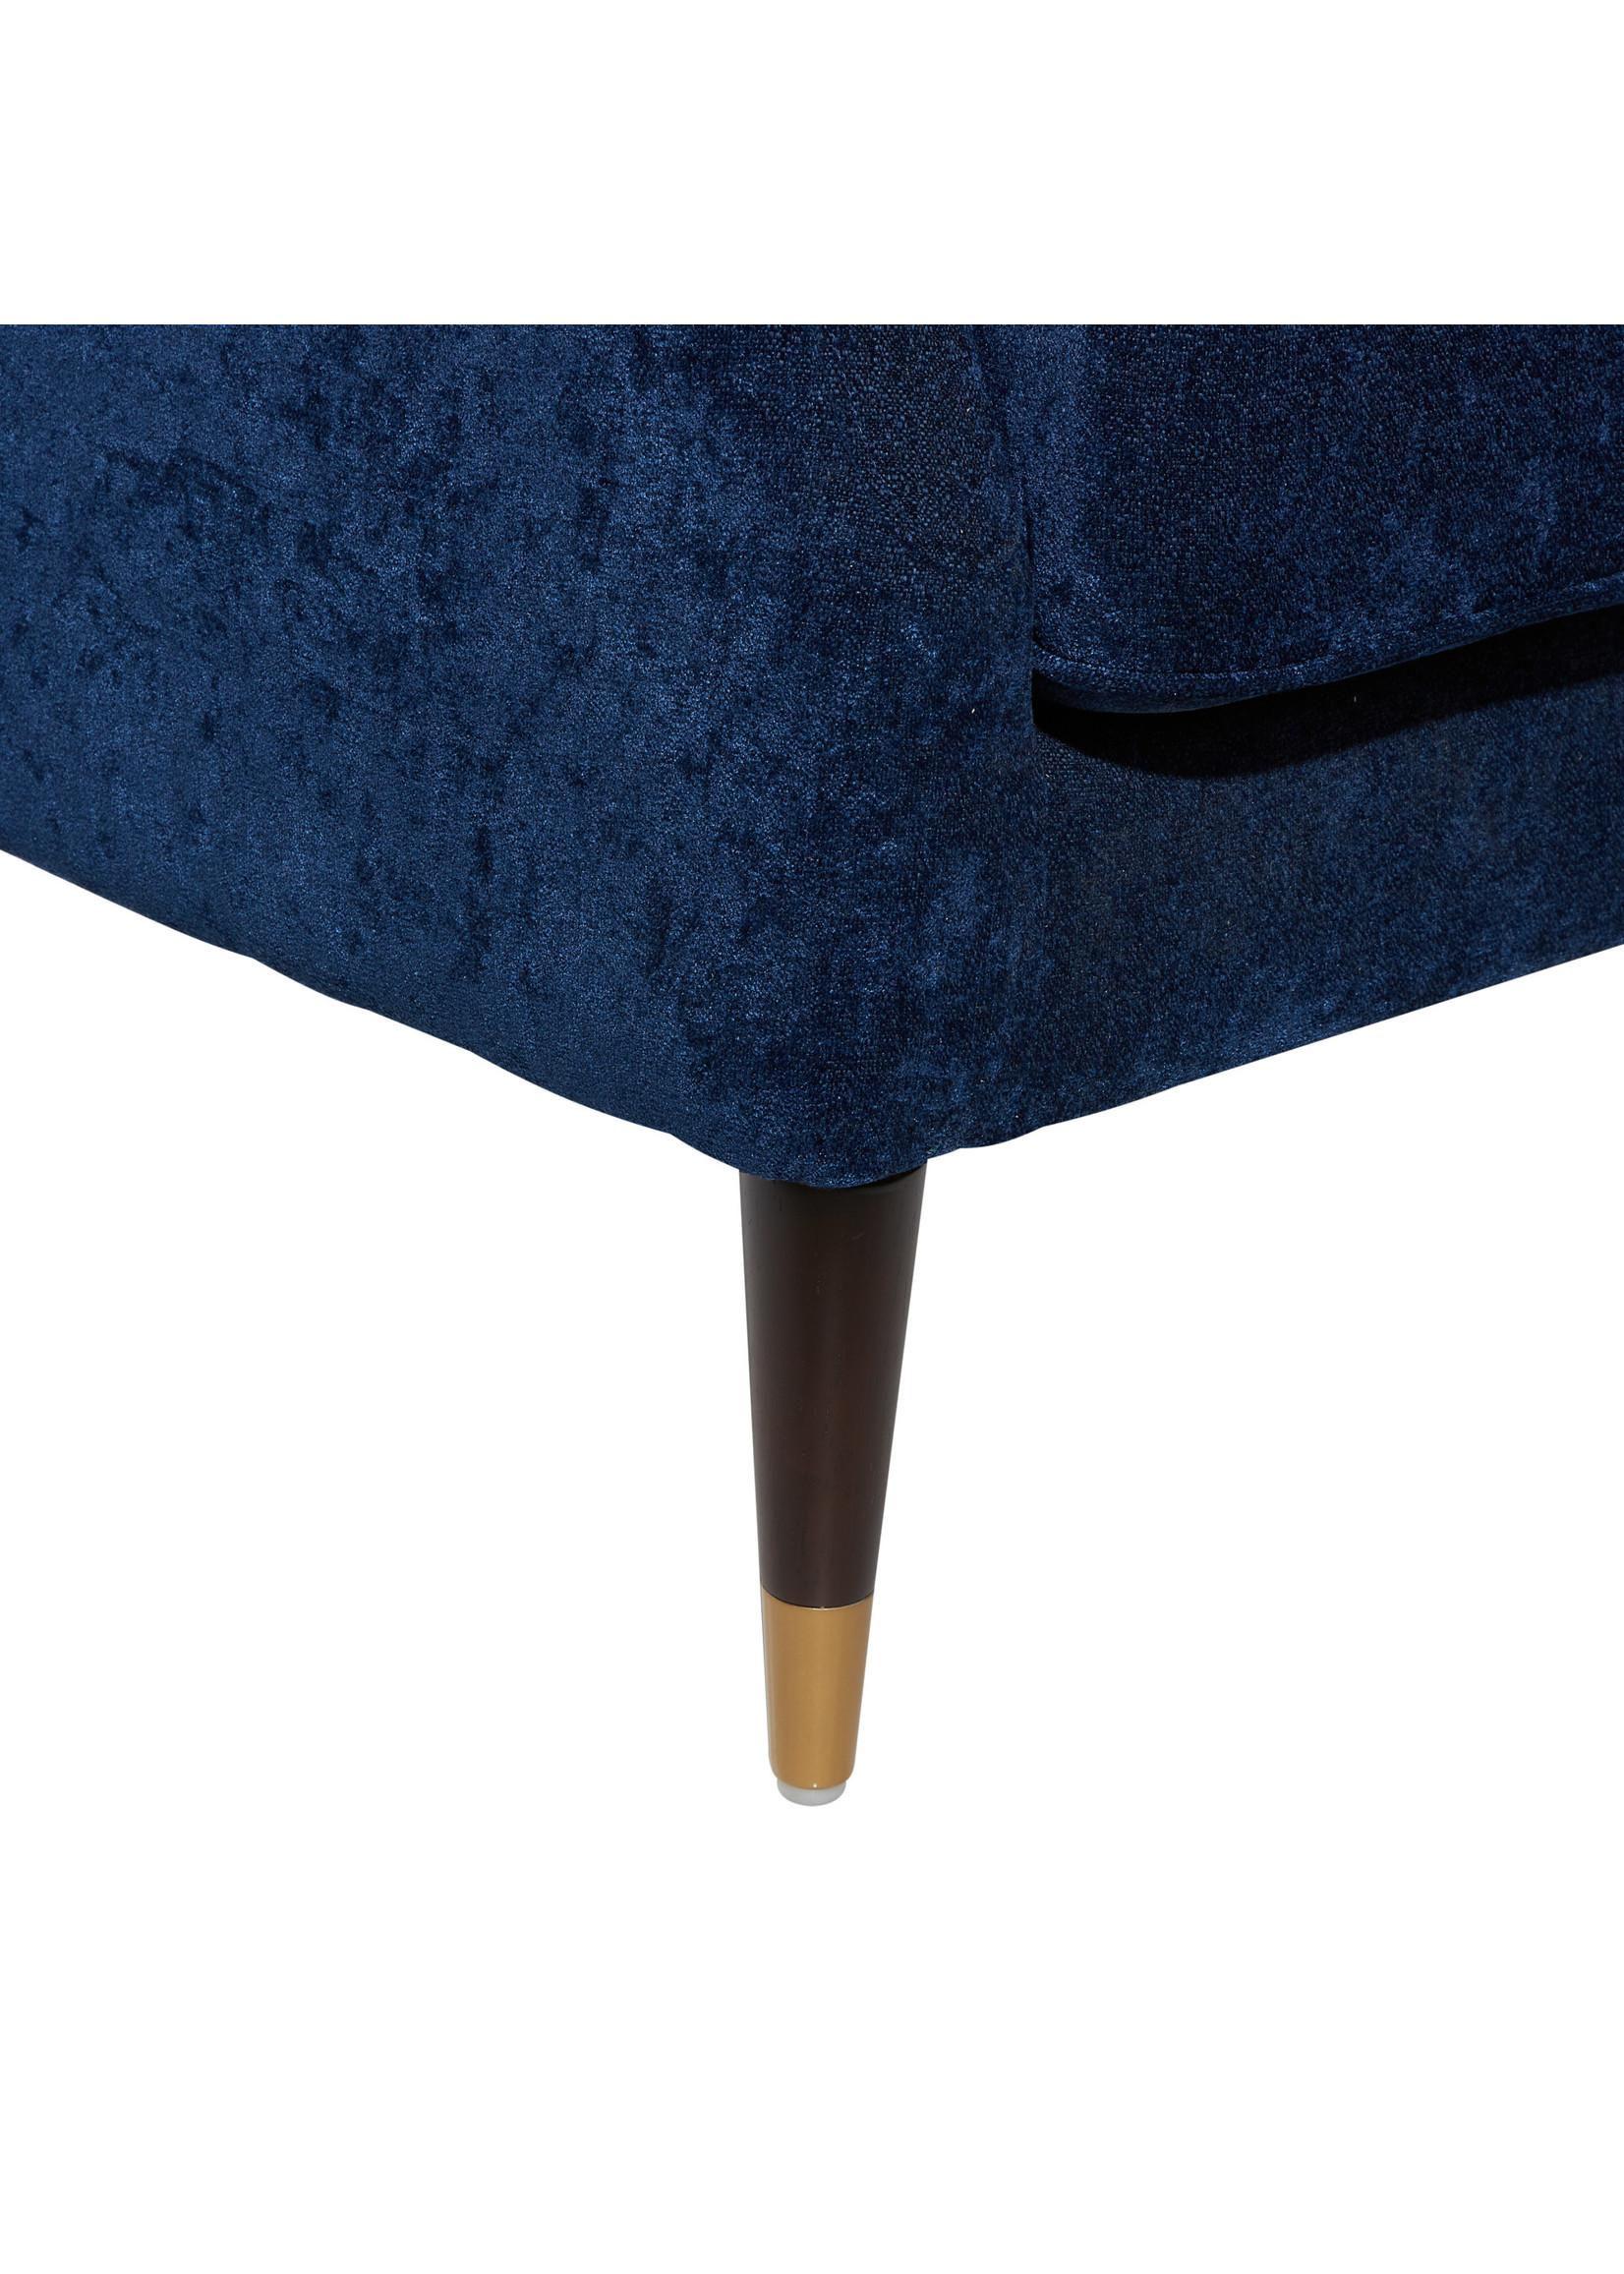 UMA Enterprises Accent Chair - Tufted Fabric Blue